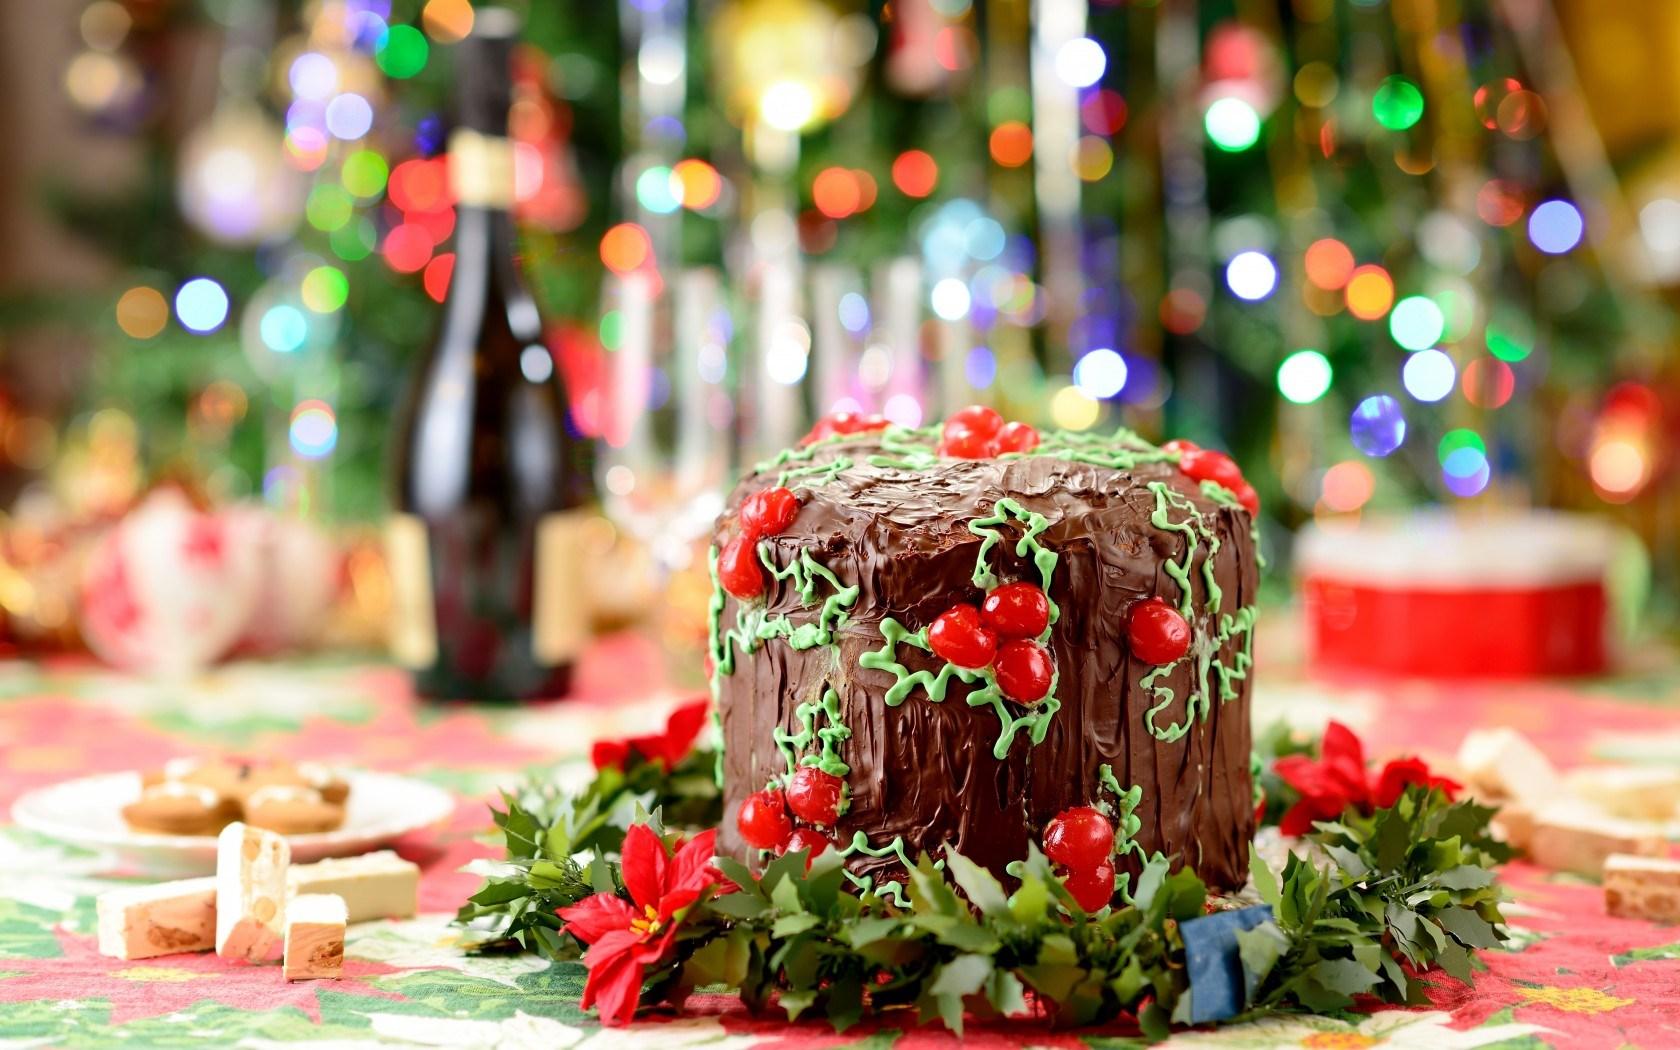 Cake Chocolate Food Holiday Winter Christmas New Year 1680x1050